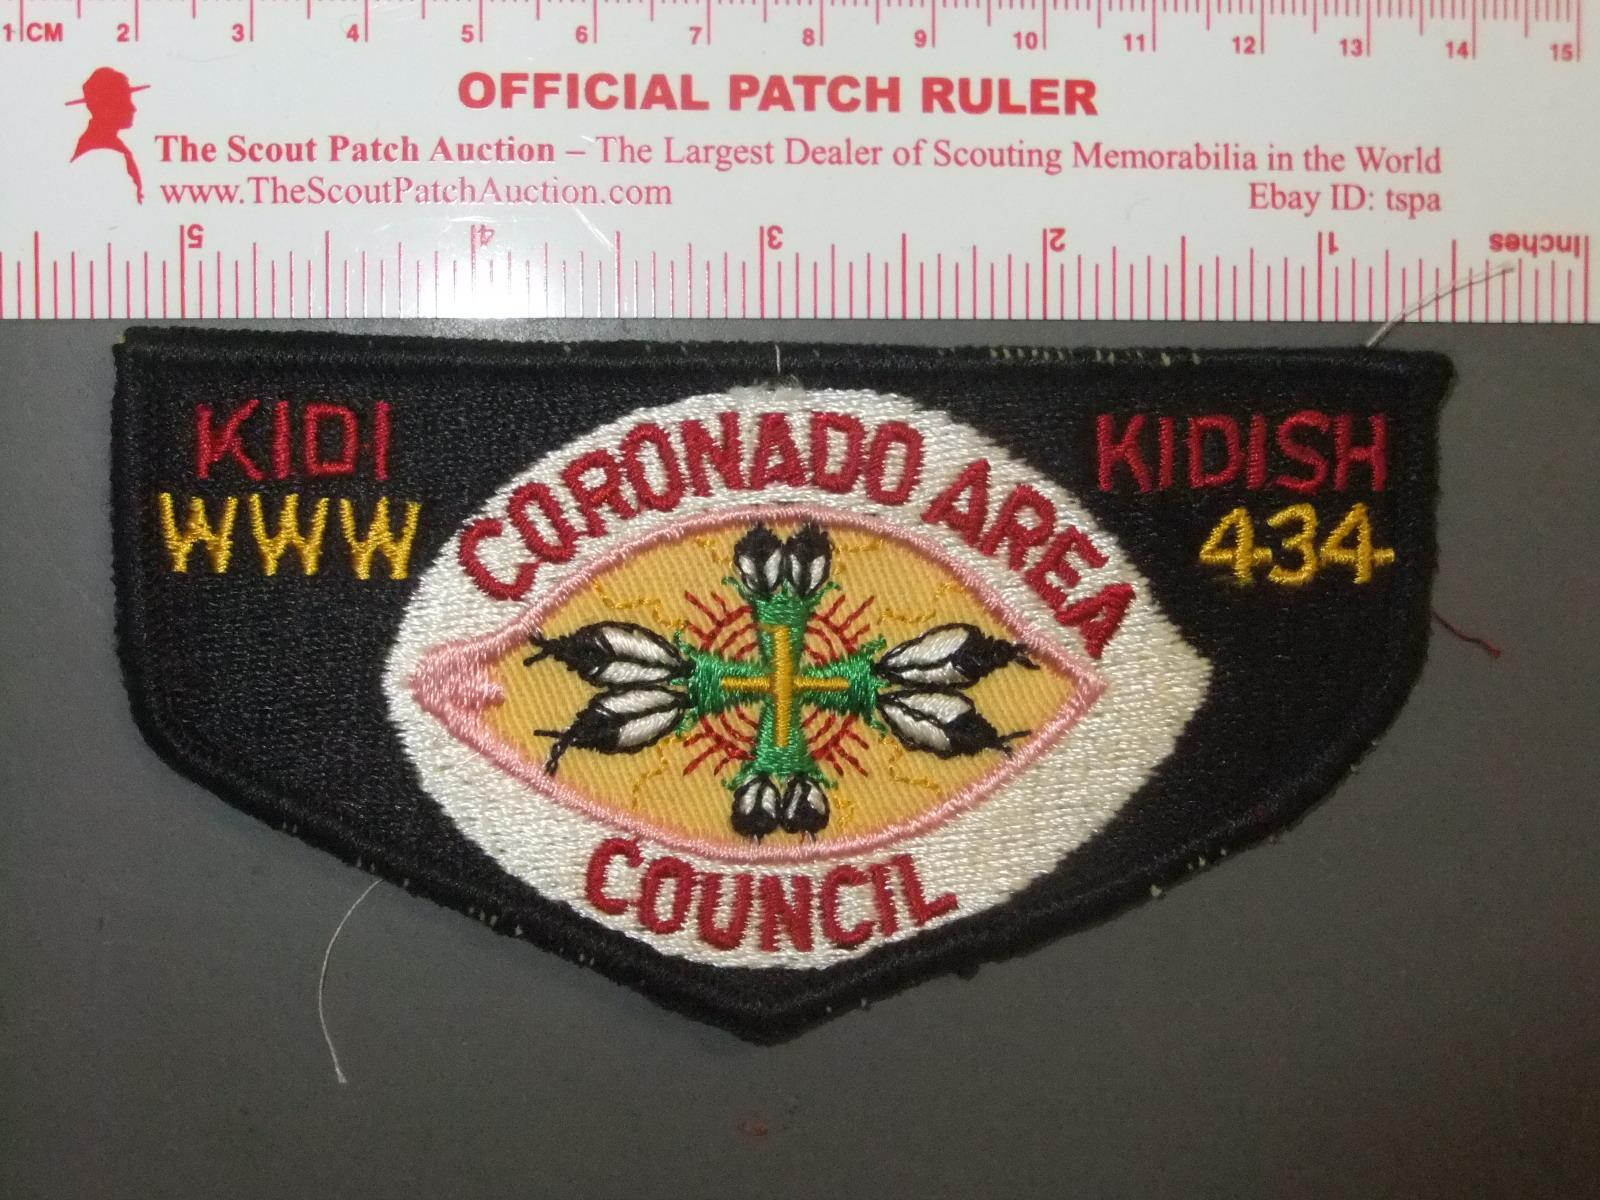 c2-56 Boy Scout OA 434 Kidi Kidish Lodge 2020 NOAC Flap Set